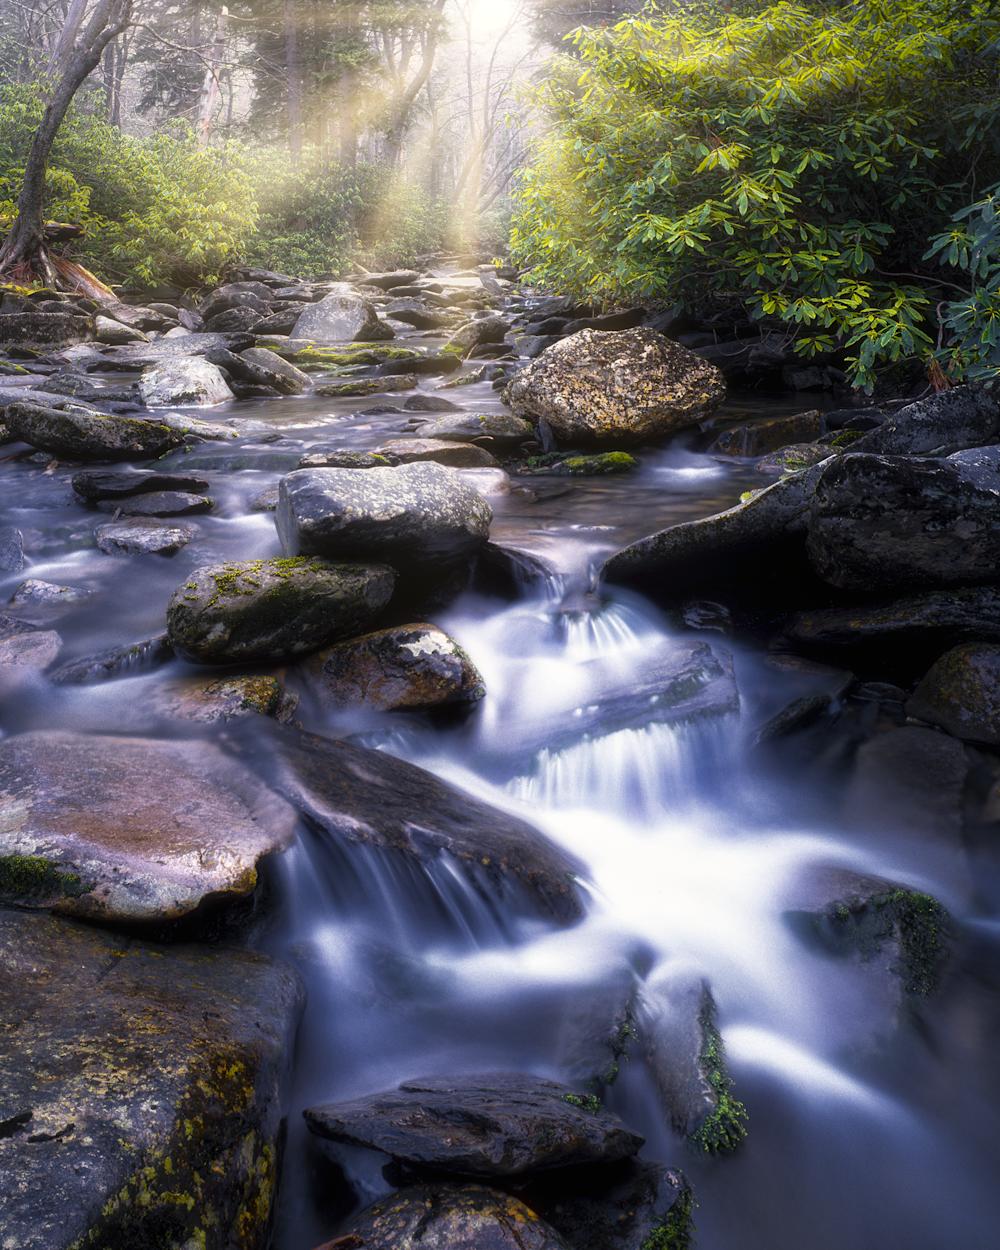 Morning Breaks Through, Great Smoky Mountain National Park